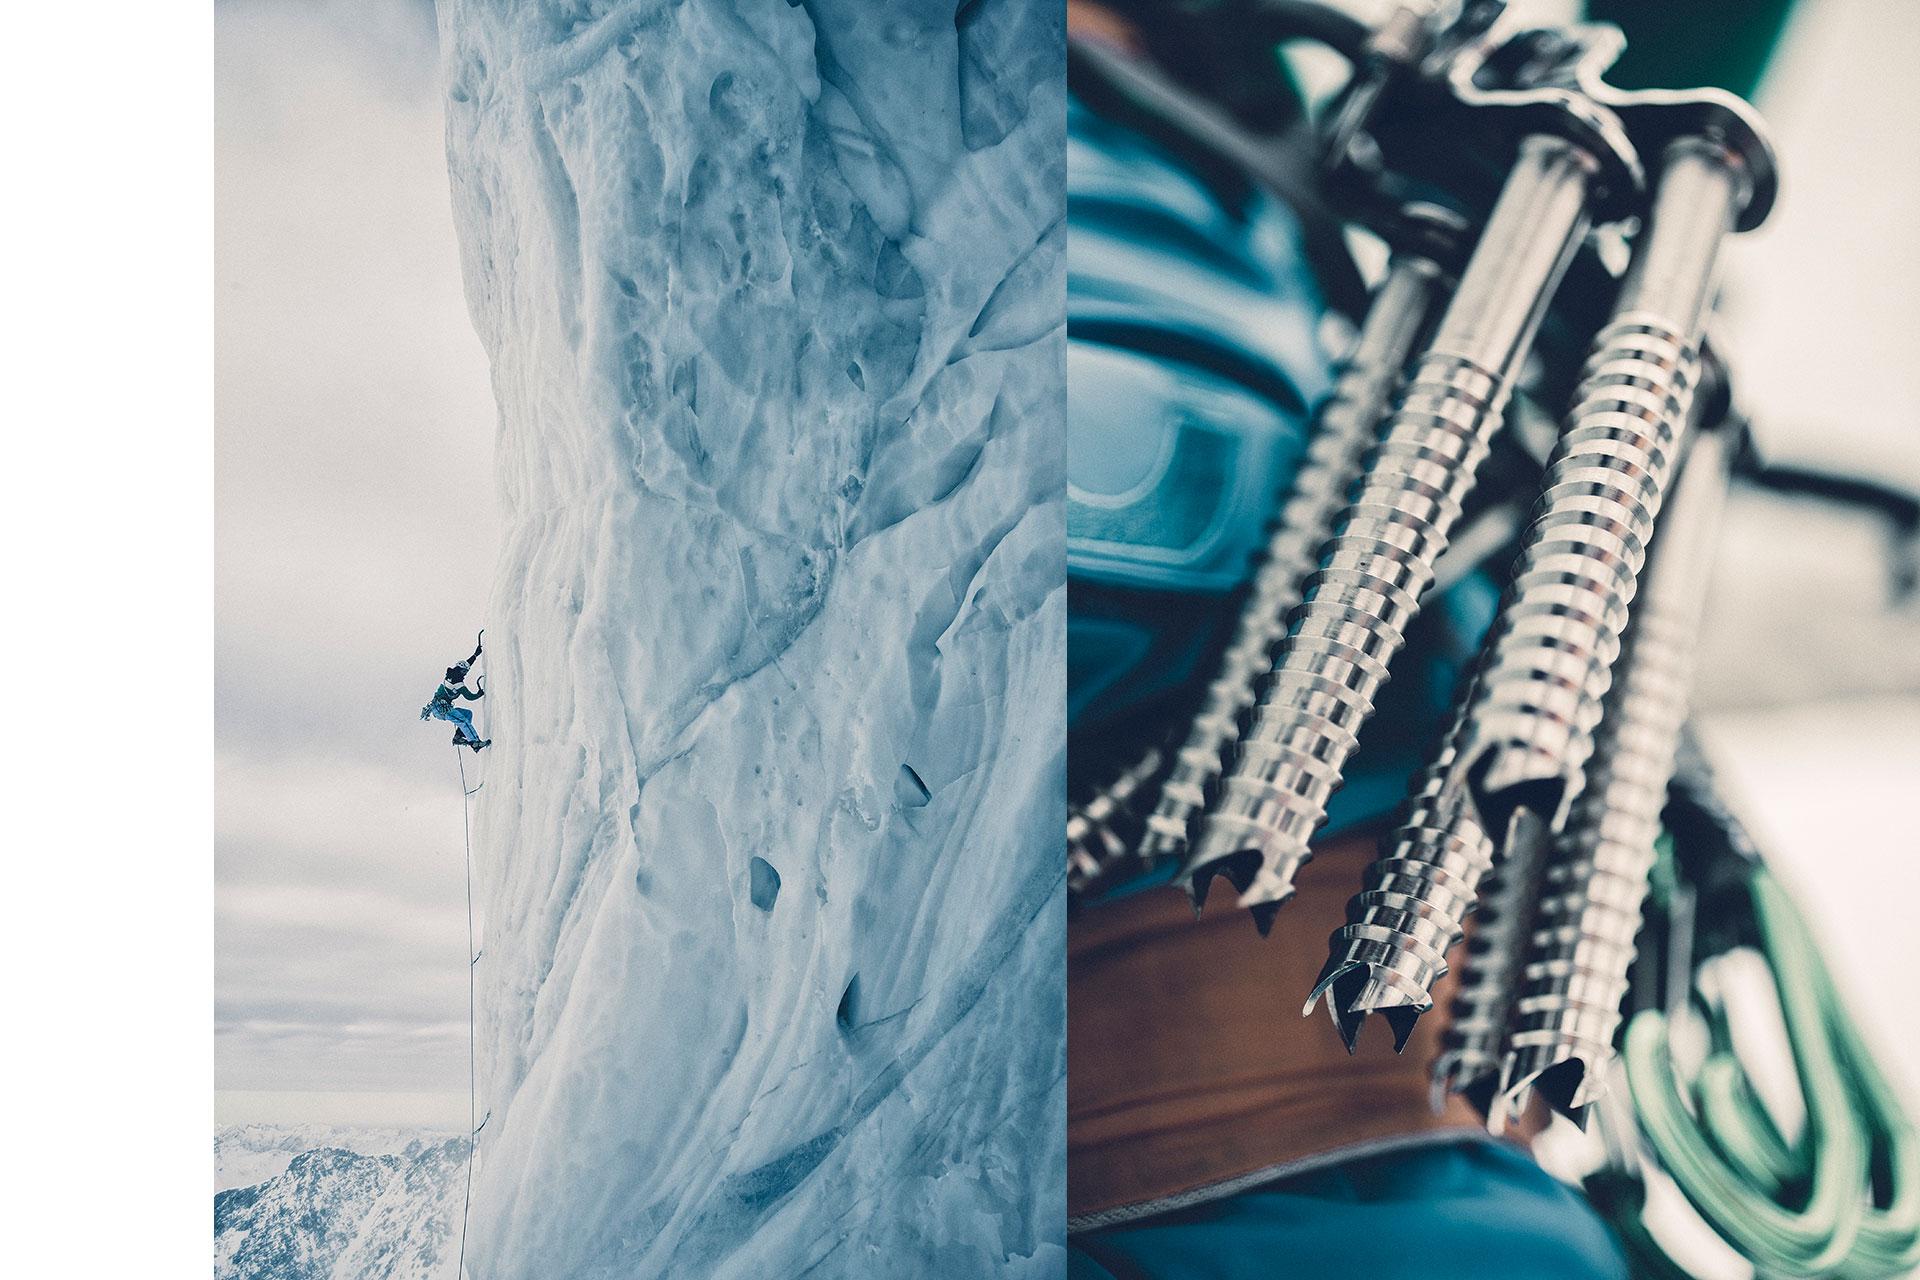 Maloja Eisklettern Wintersport Extremsport Berge Fotograf Michael Müller